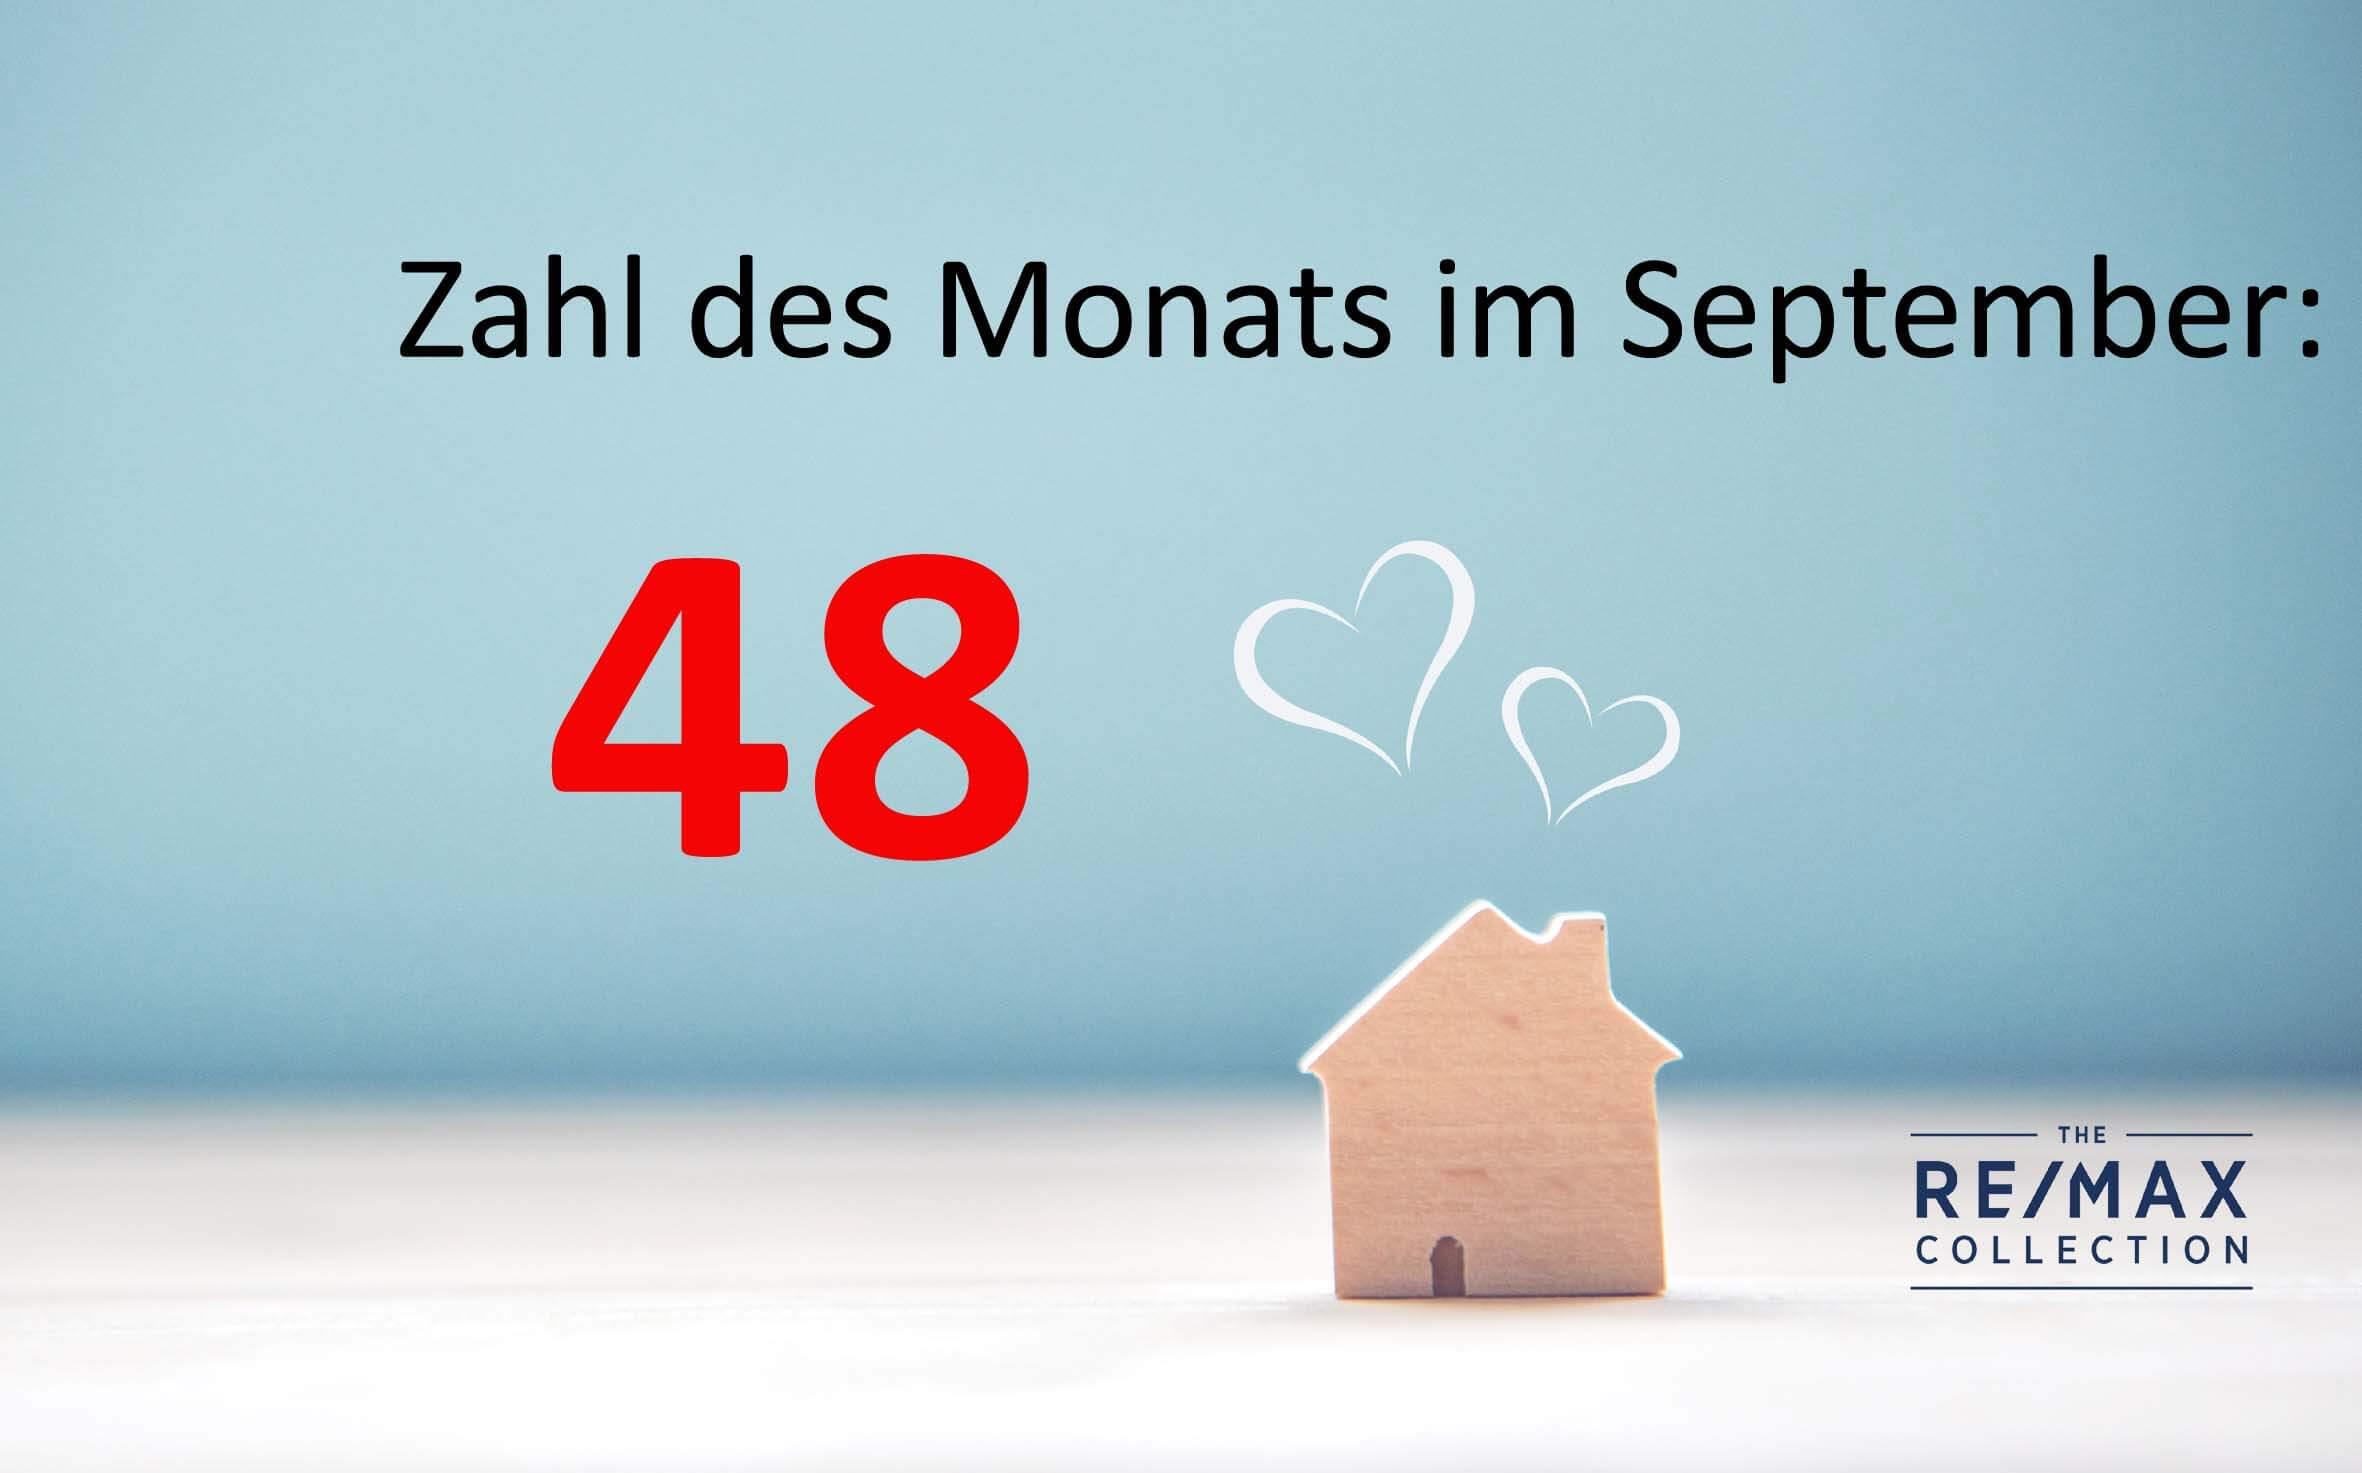 Zahl des Monats_September